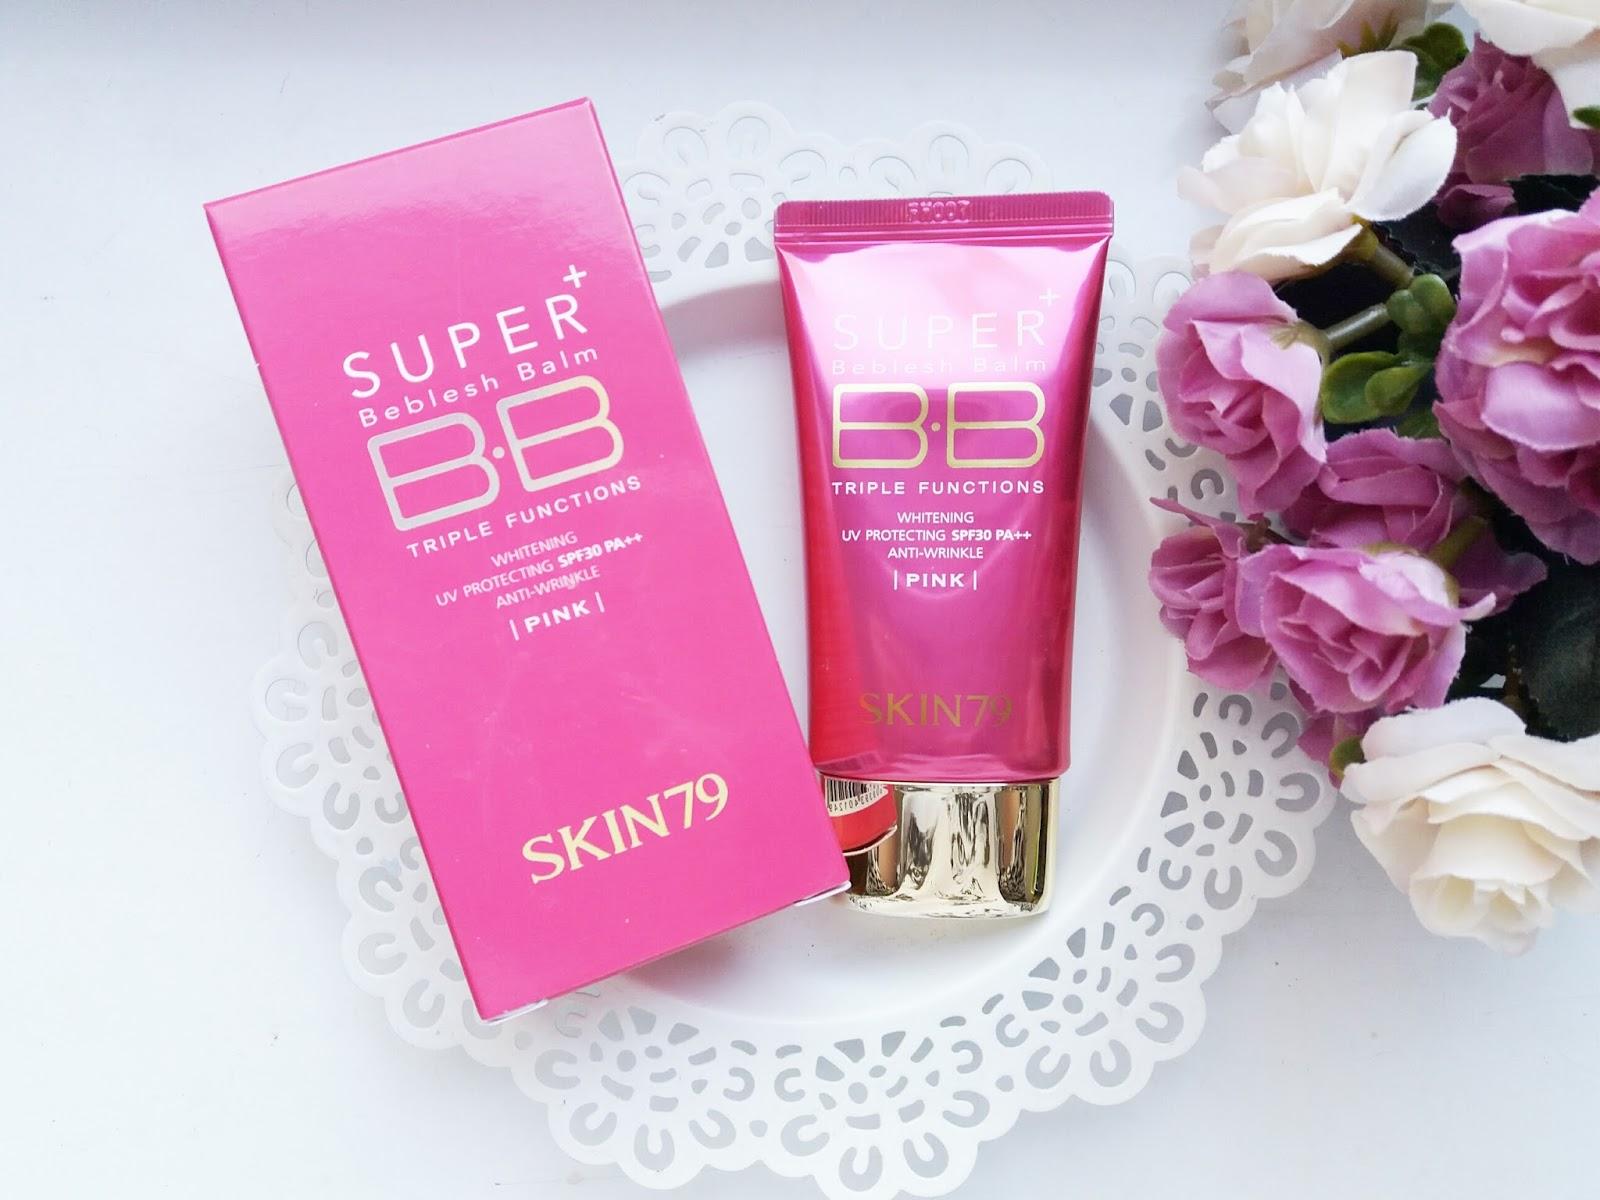 Skin79 hot pink bb cream